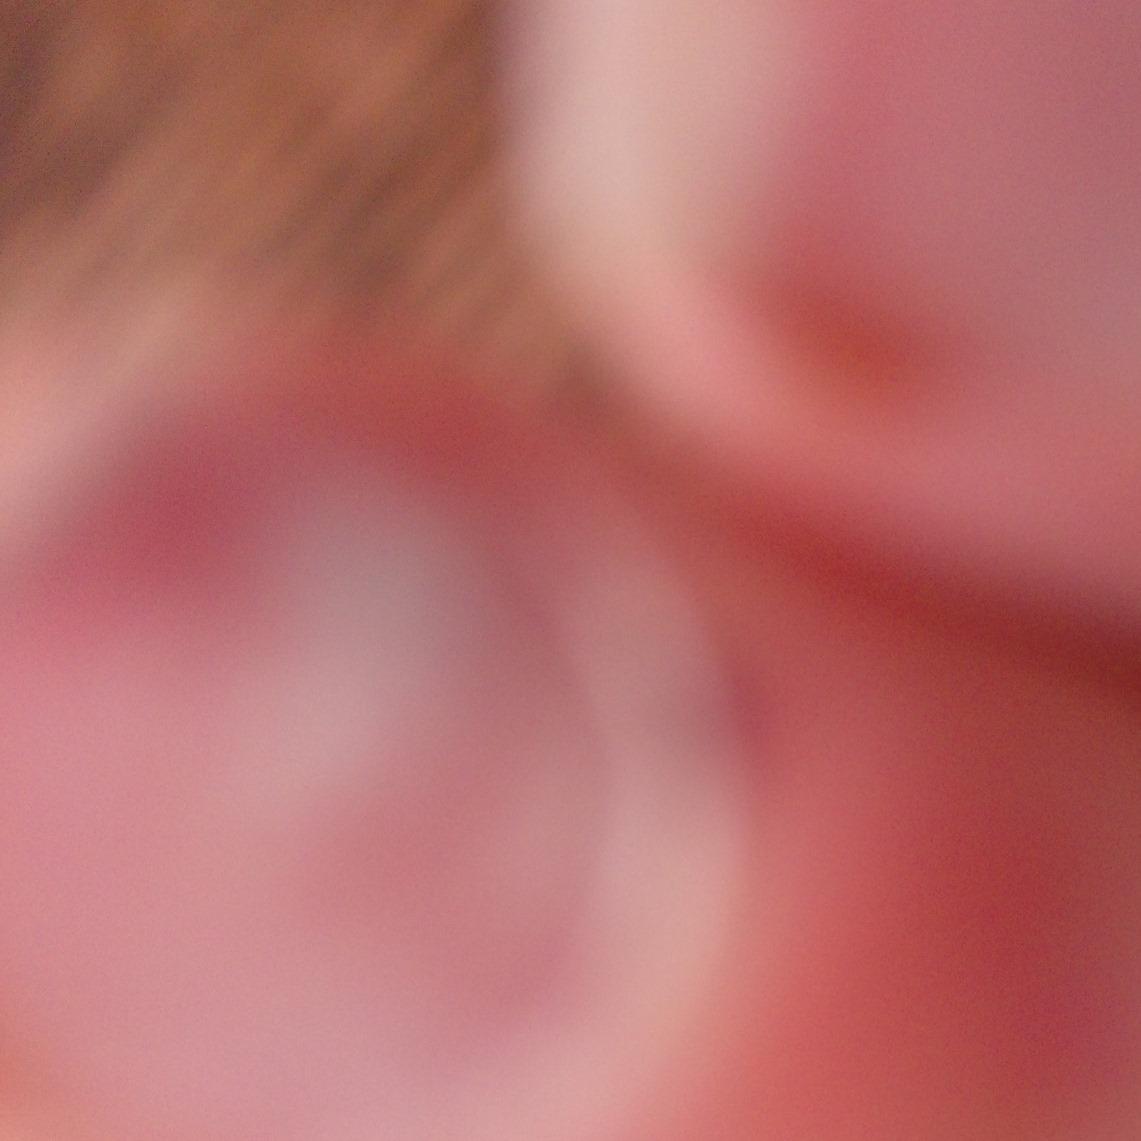 Cuticles